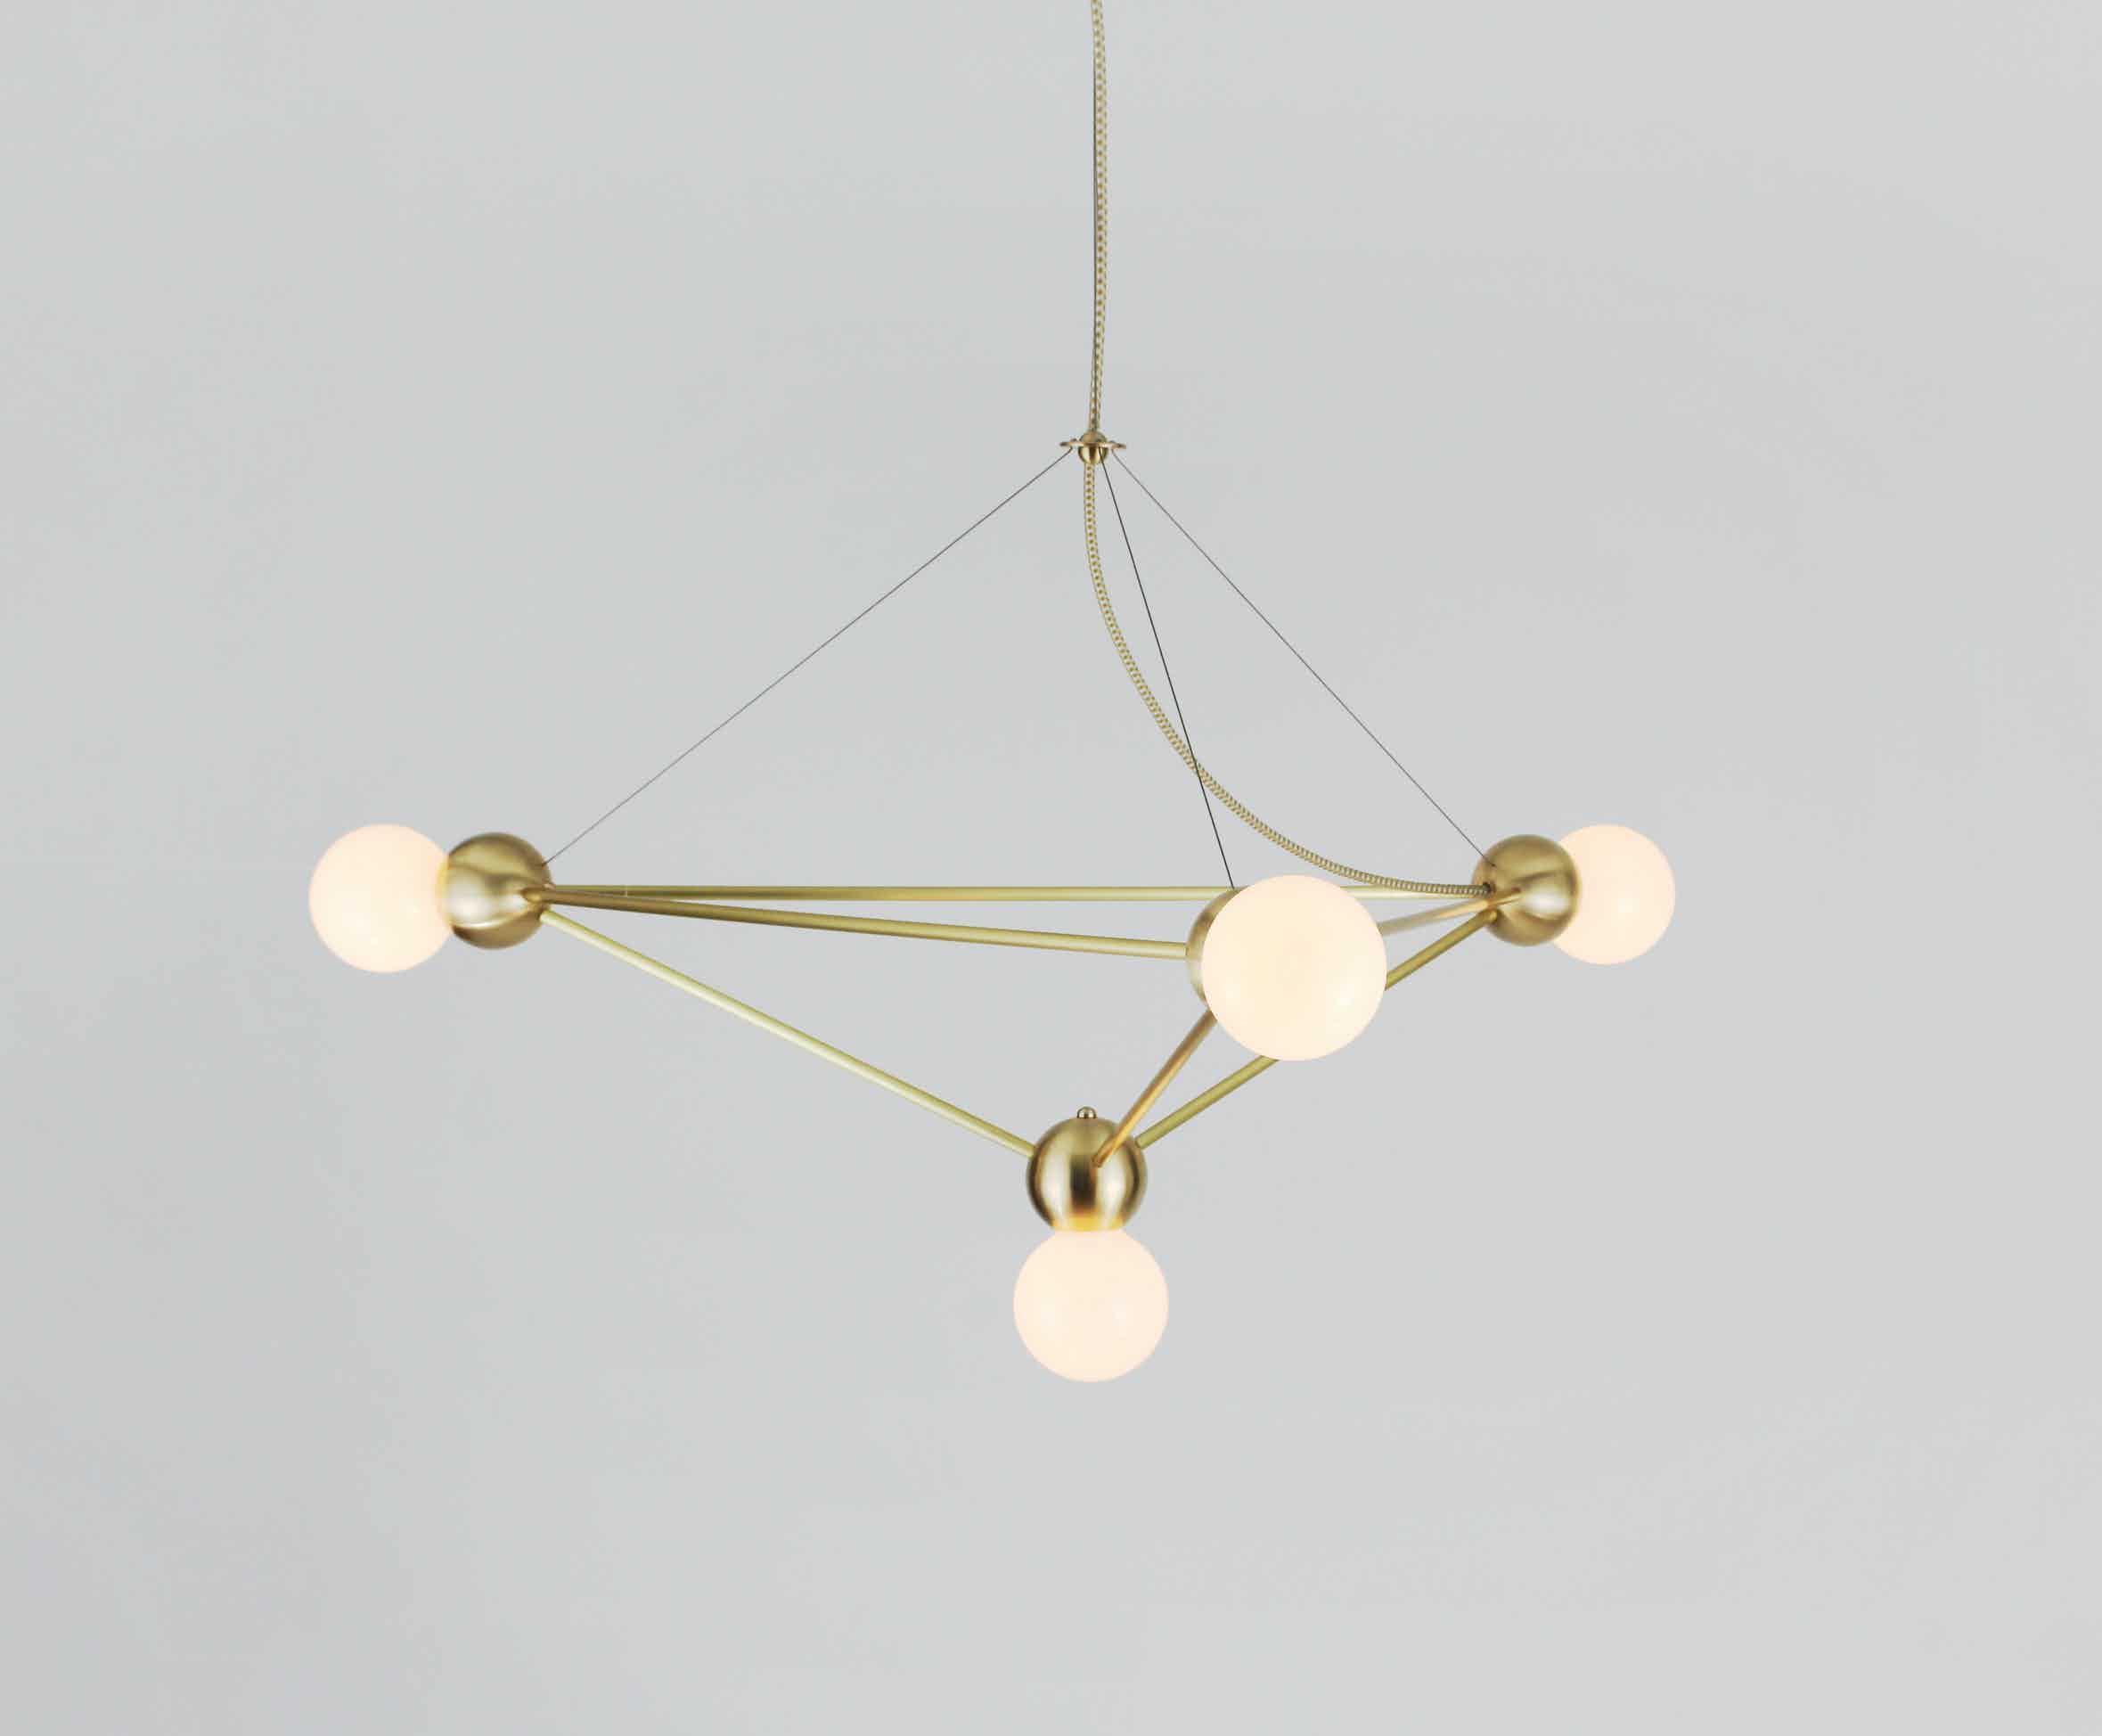 Rosie li lina 04 light pyramid lg chandelier brass angle haute living